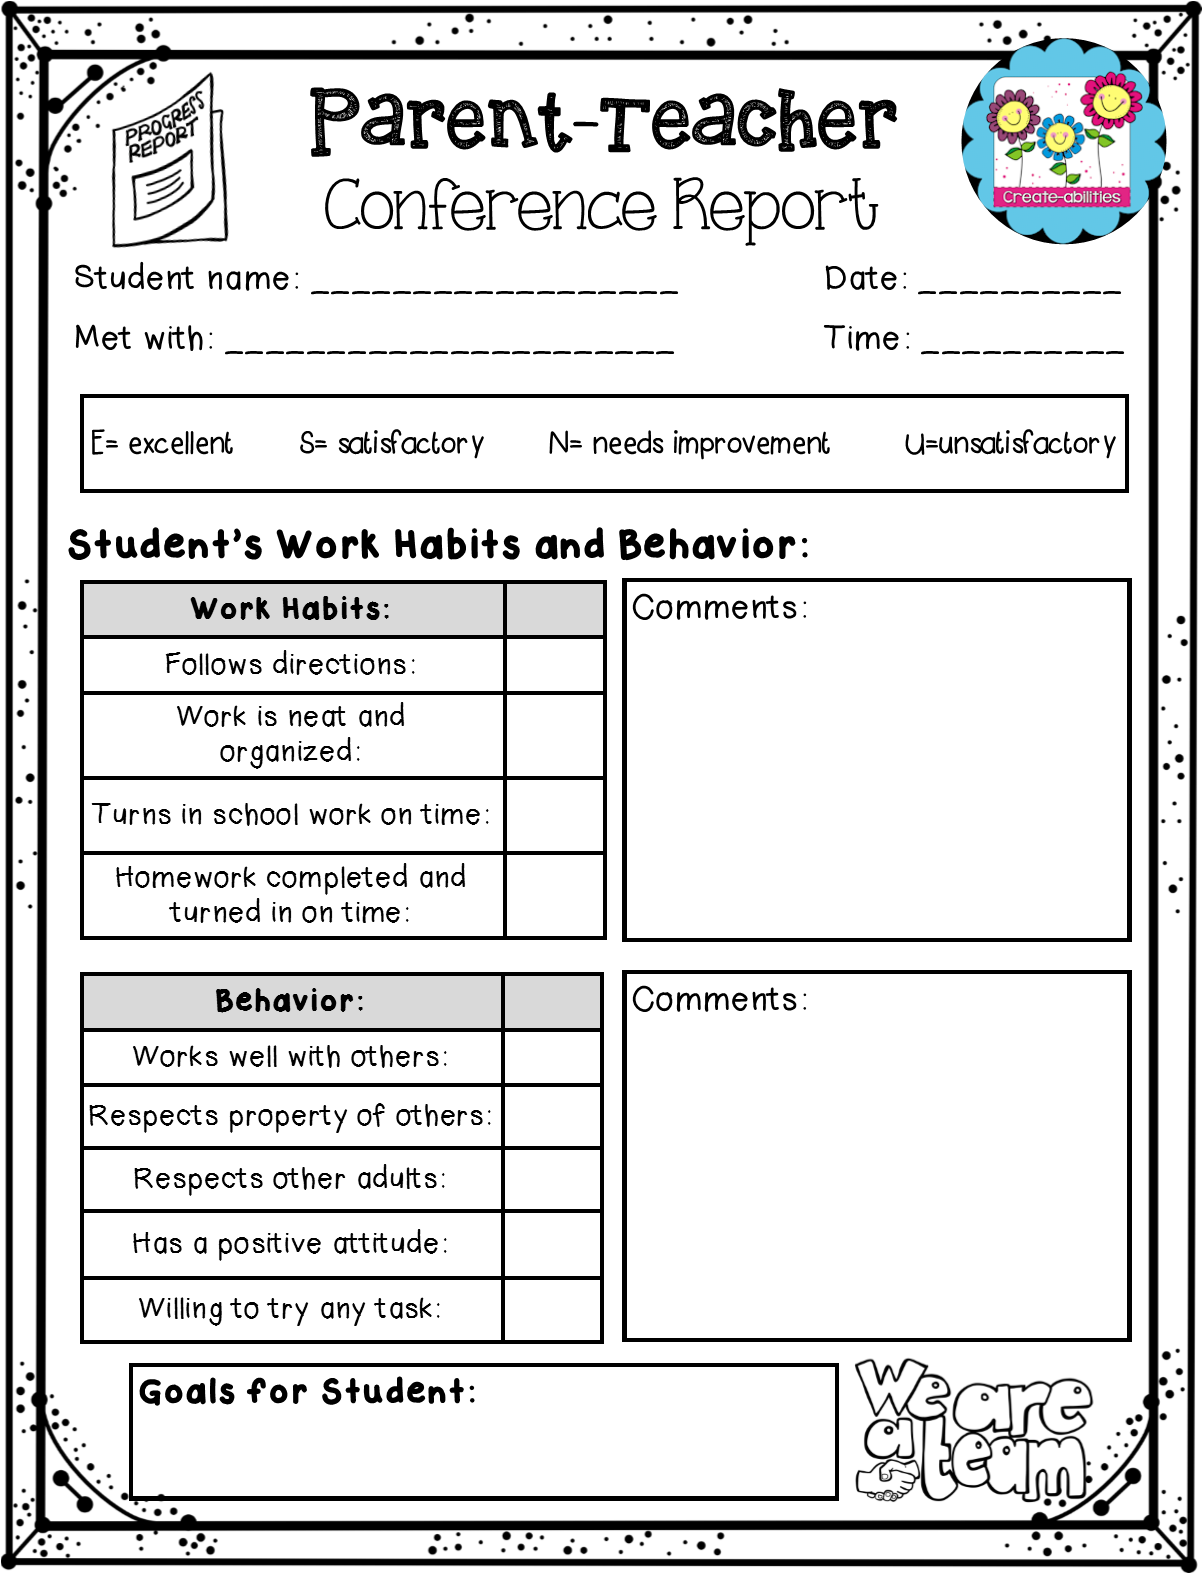 Parent teacher conference request letter template example good parent teacher conference request letter template parent teacher conferences template of parent invitation parent teacher conferences spiritdancerdesigns Images